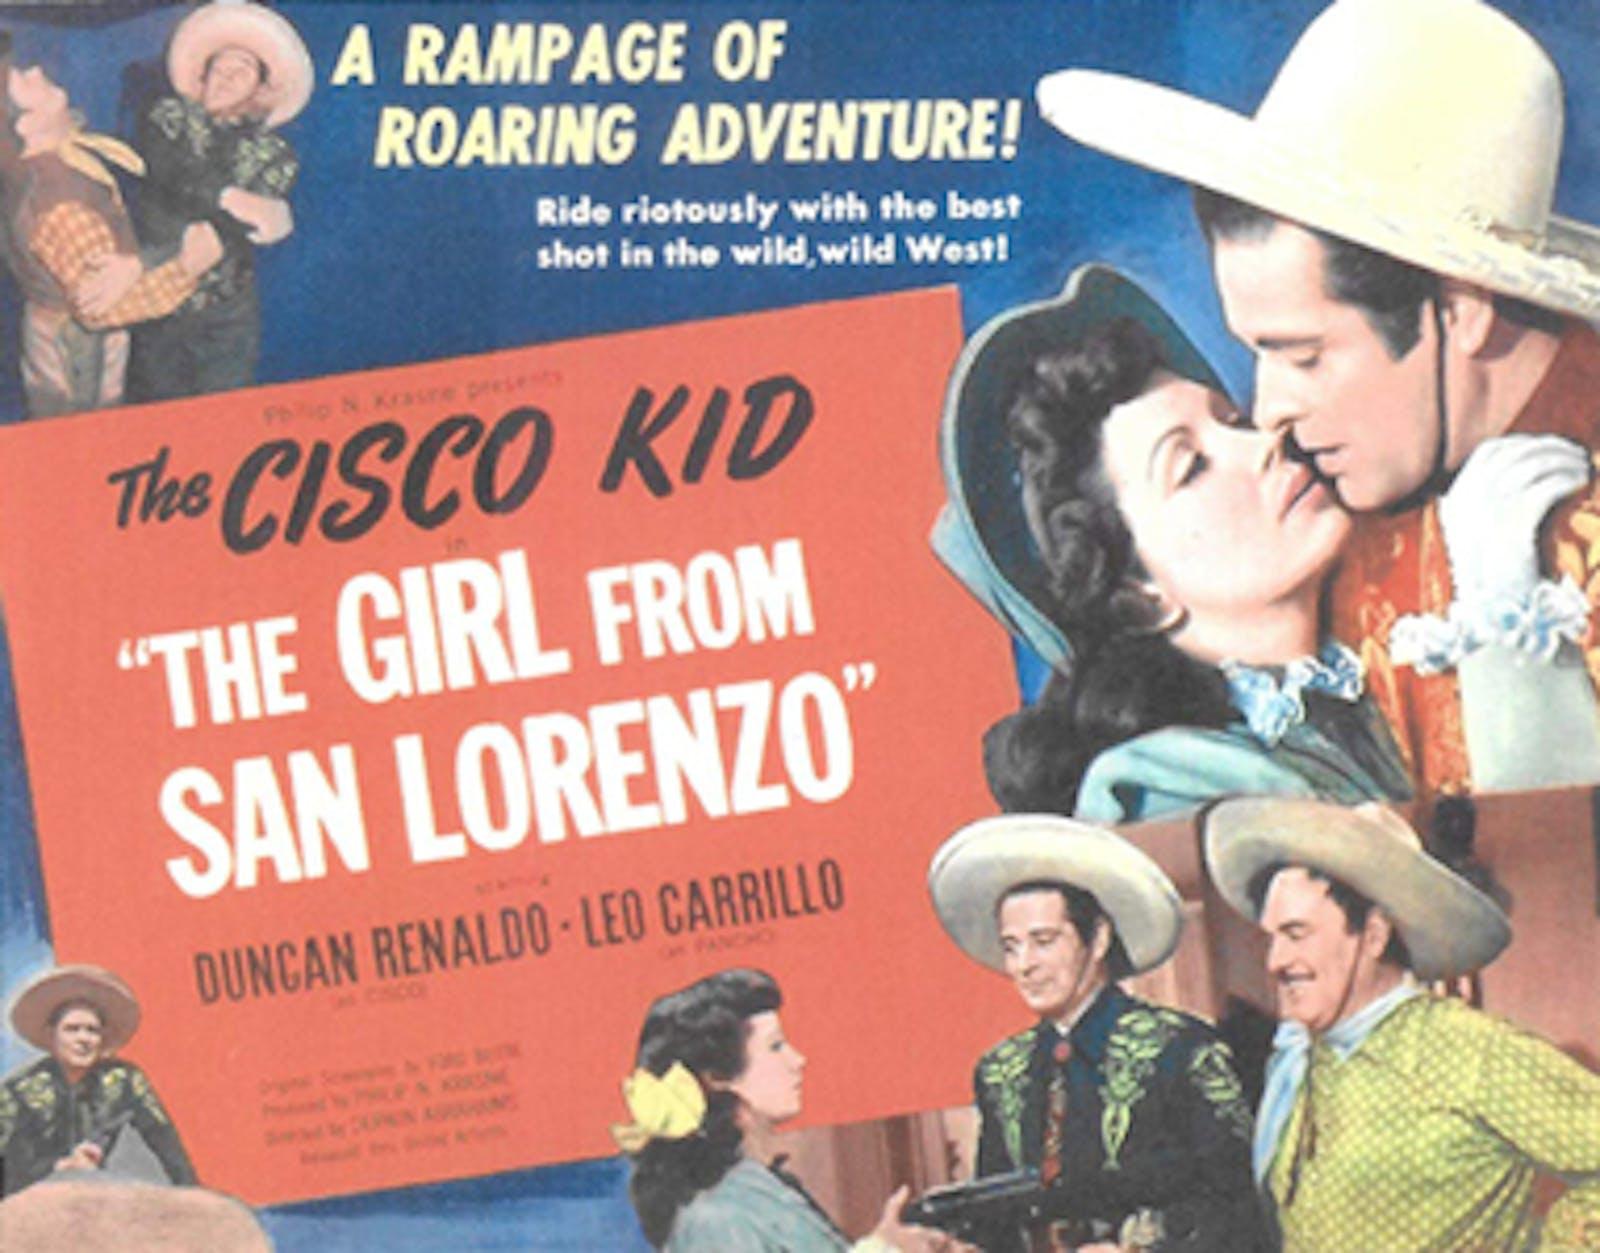 the Girl from San Lorenzo lobby card